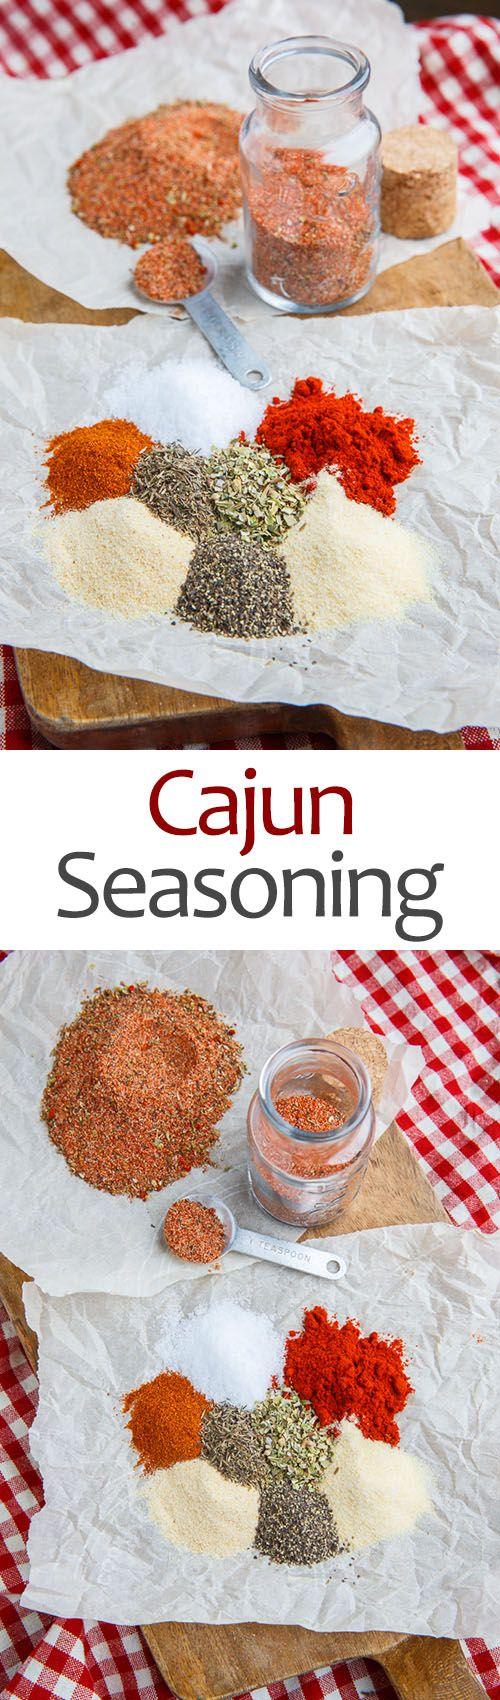 Cajun Seasoning | Closet Cooking